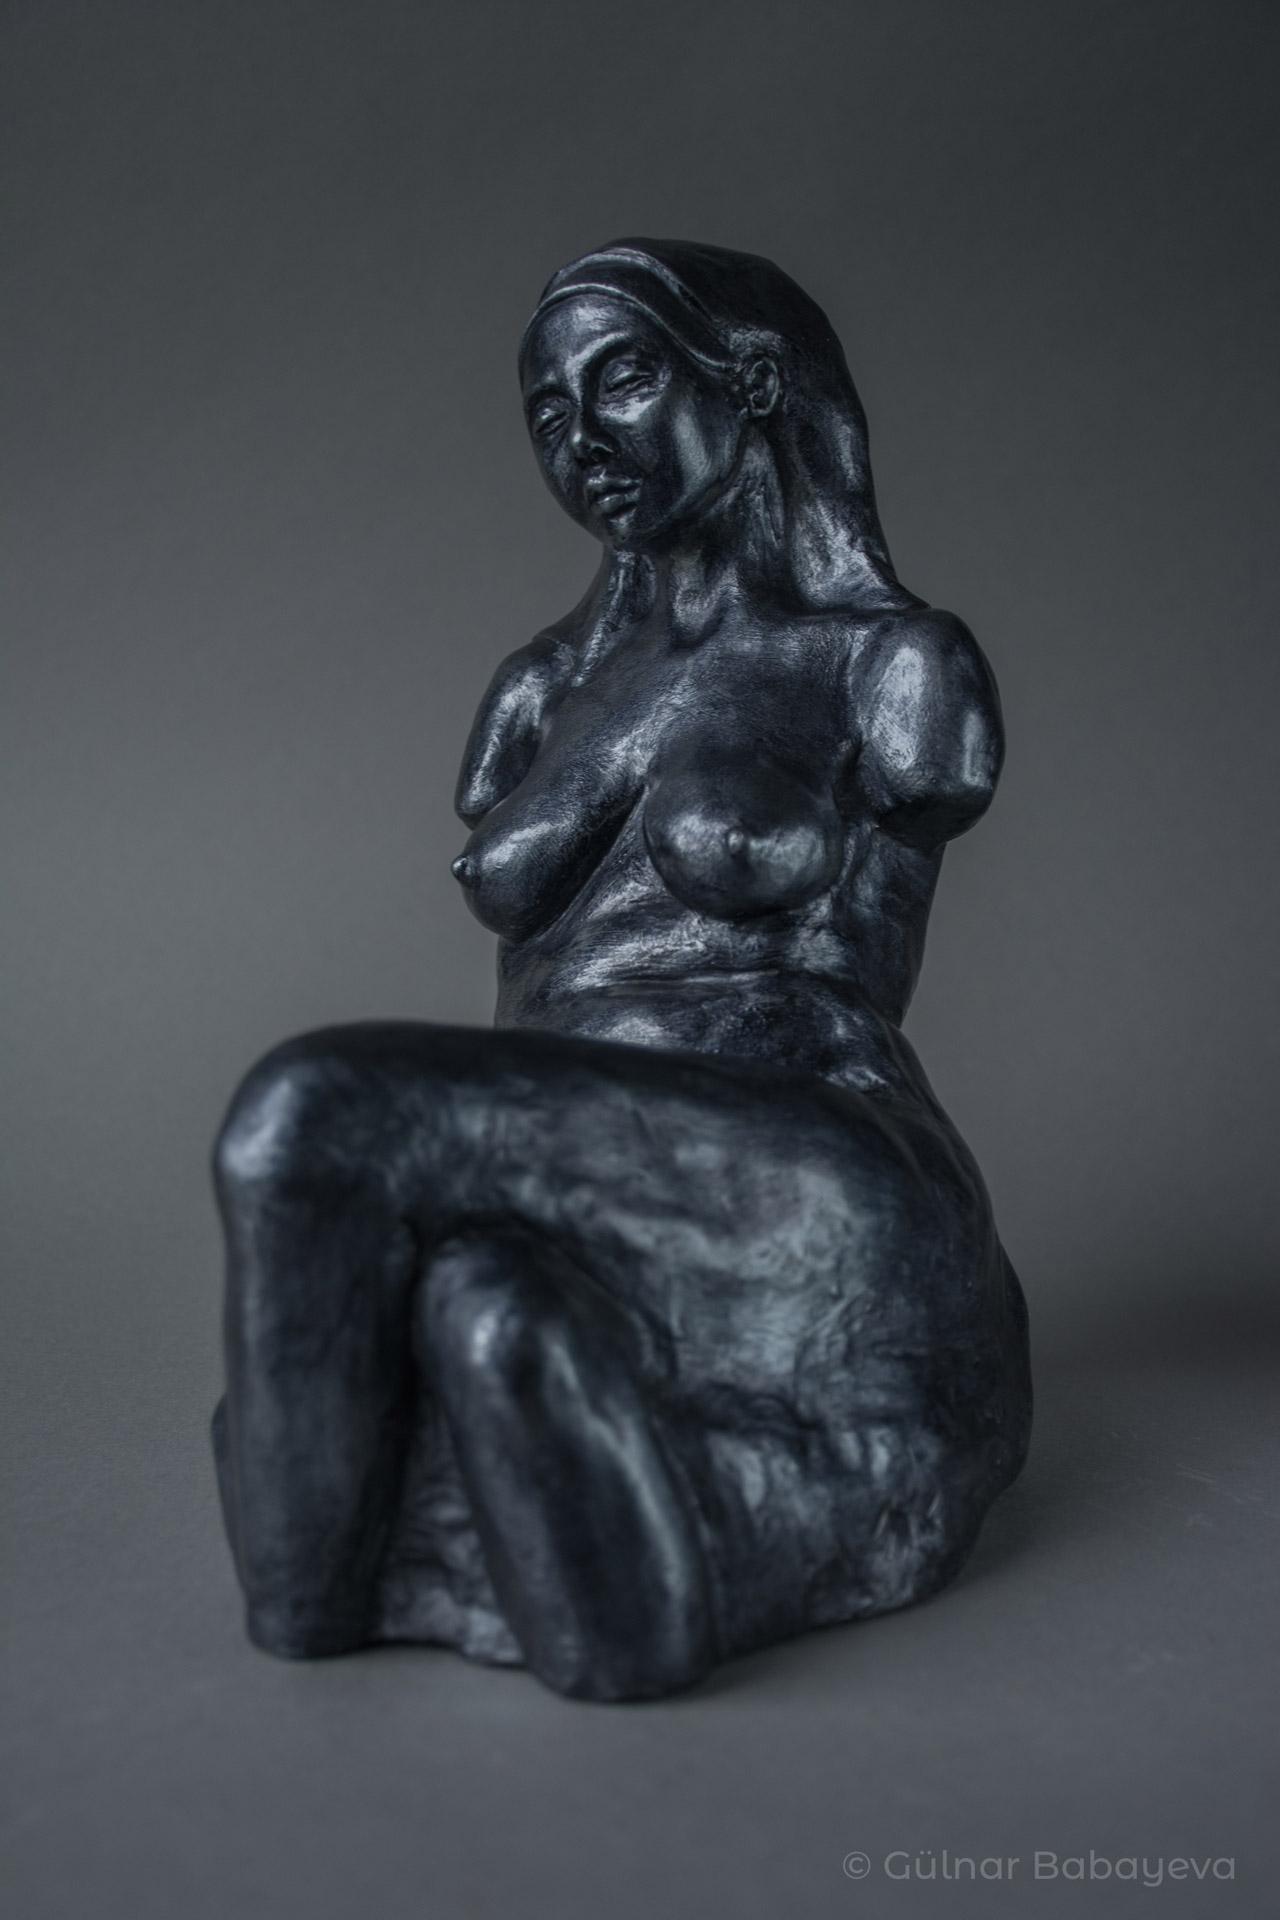 GülnarBabayeva_SittingFigureStudy_2019-2021_Ceramic_9.5Hx6Wx9D-39ed961e